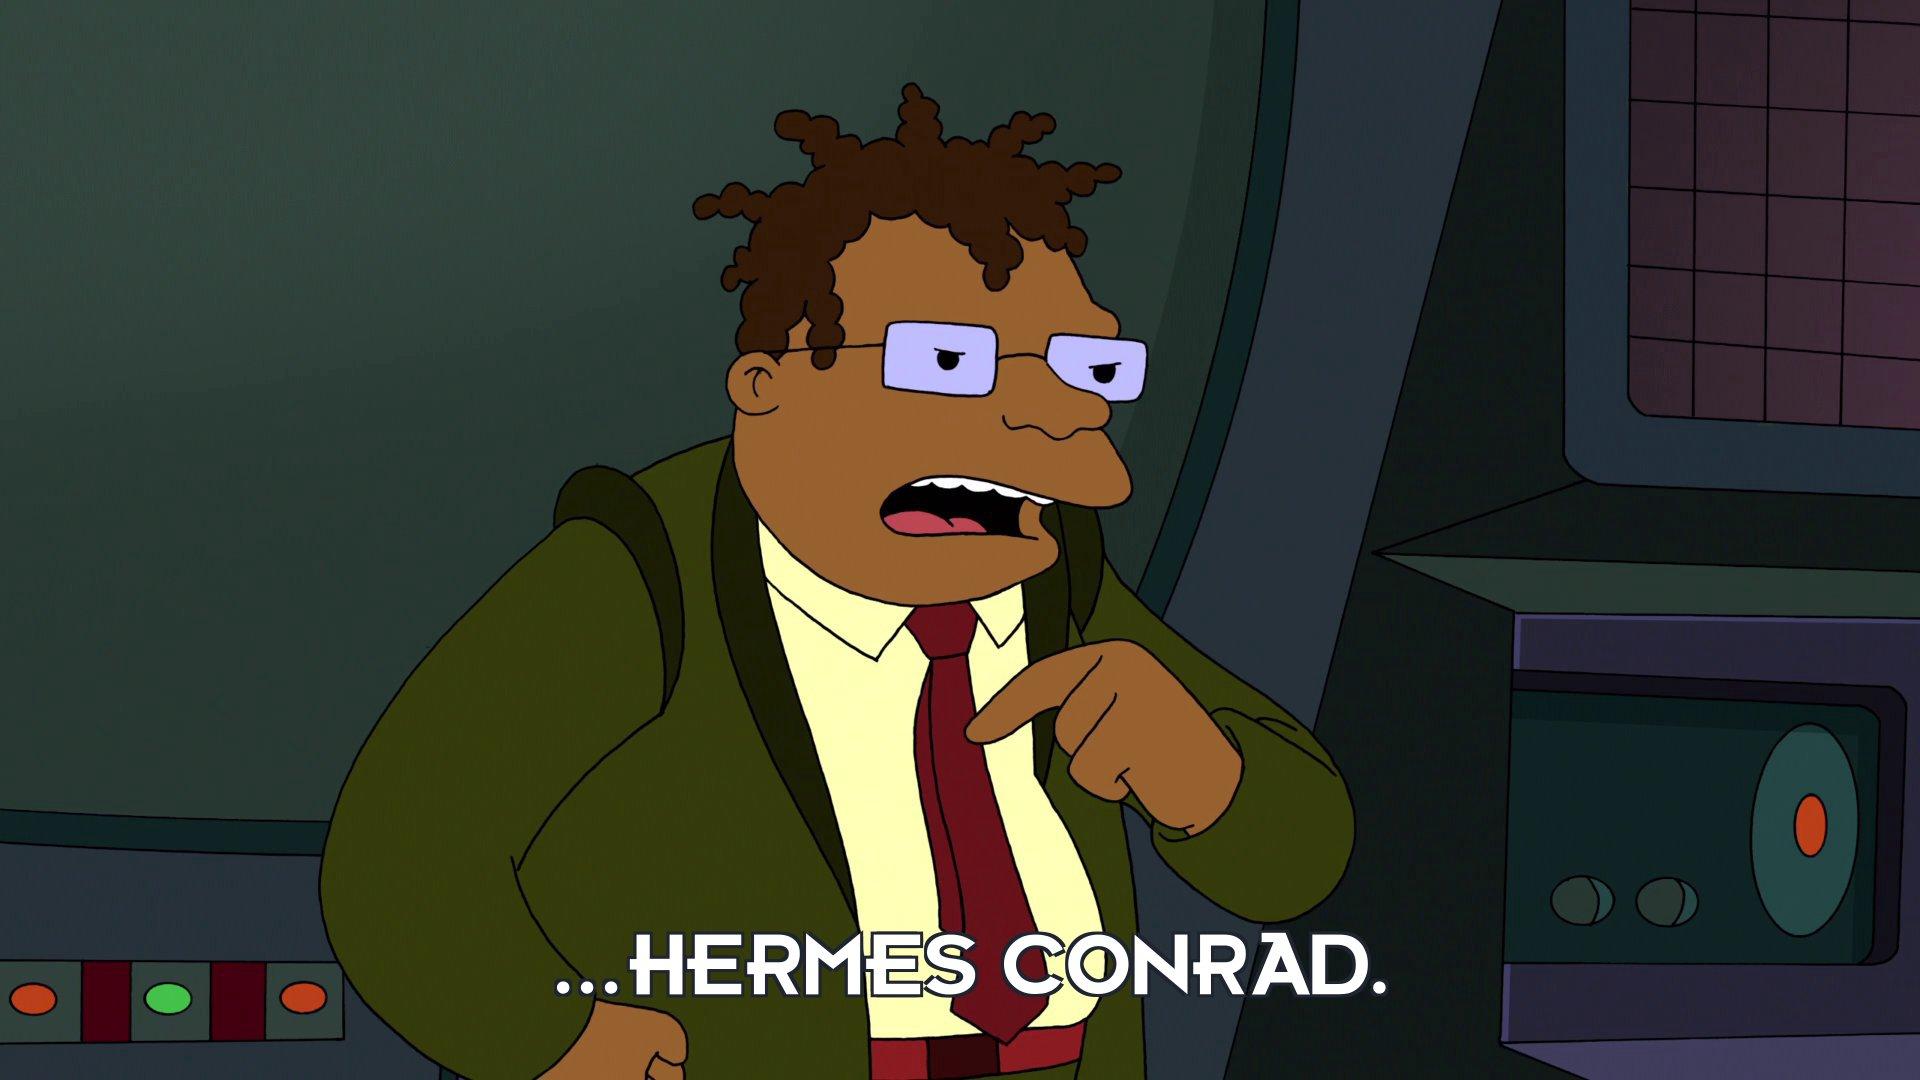 Hermes Conrad: ...Hermes Conrad.